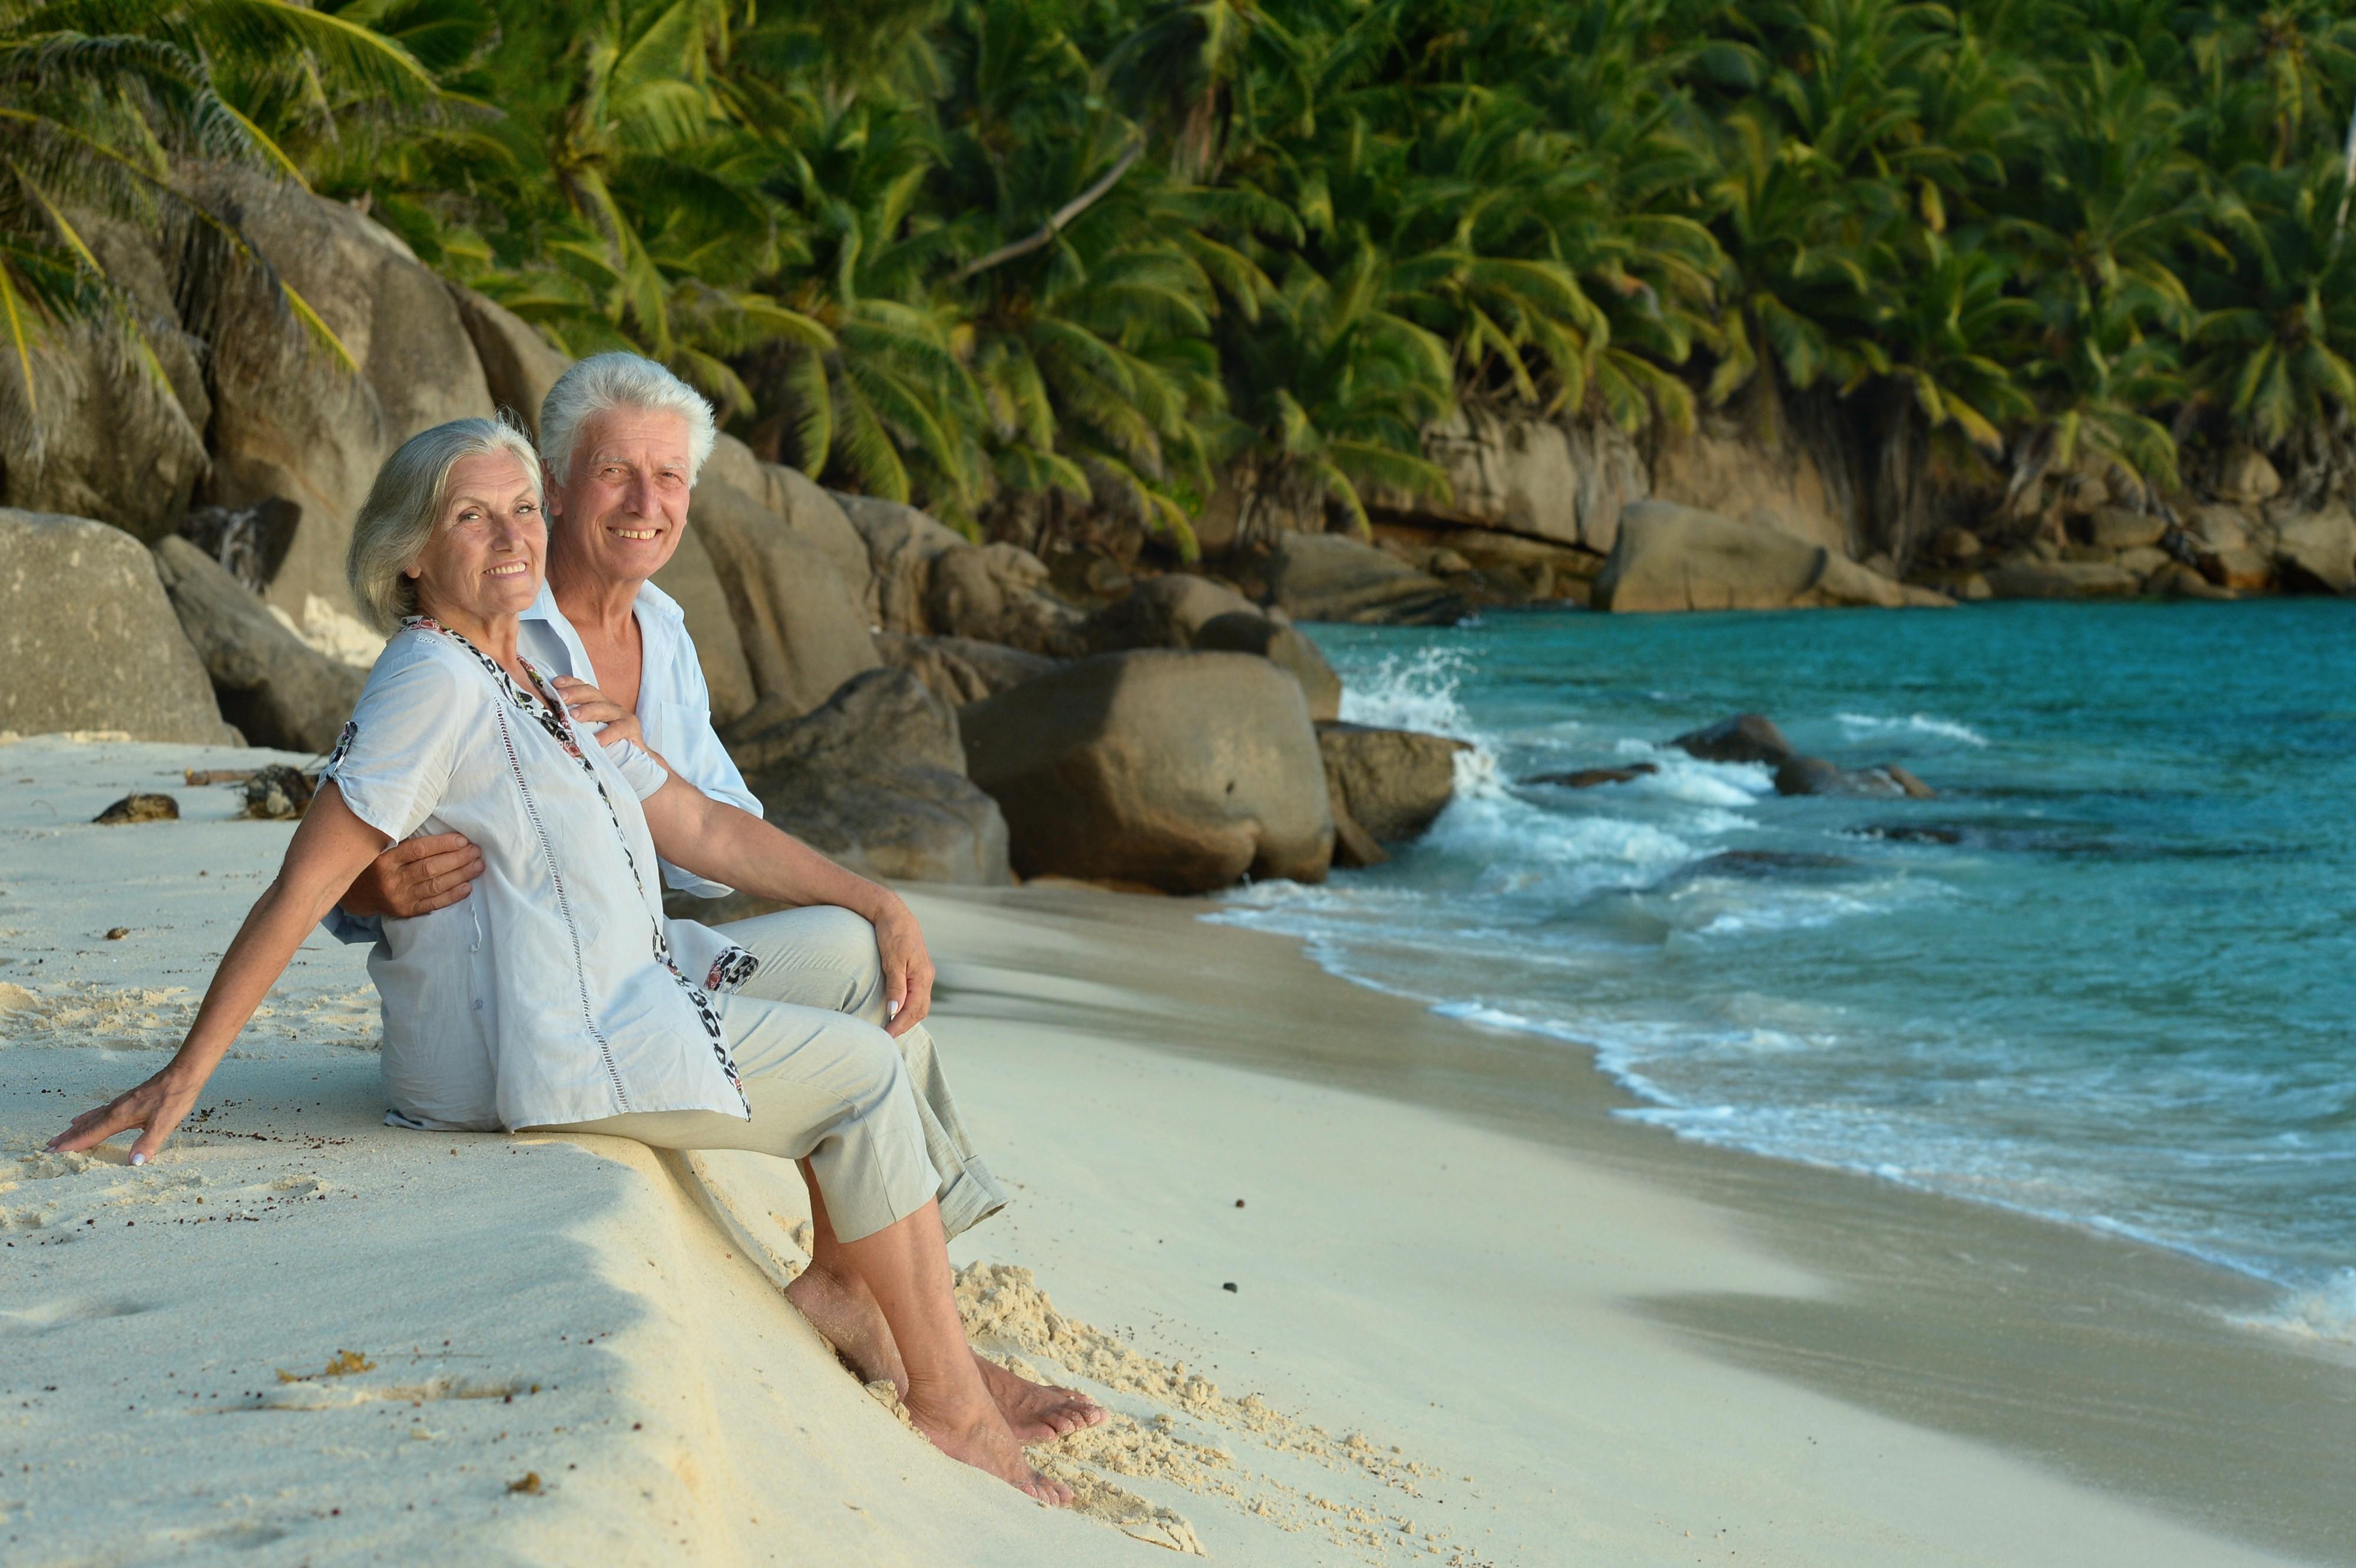 Baby boomers luxury travel